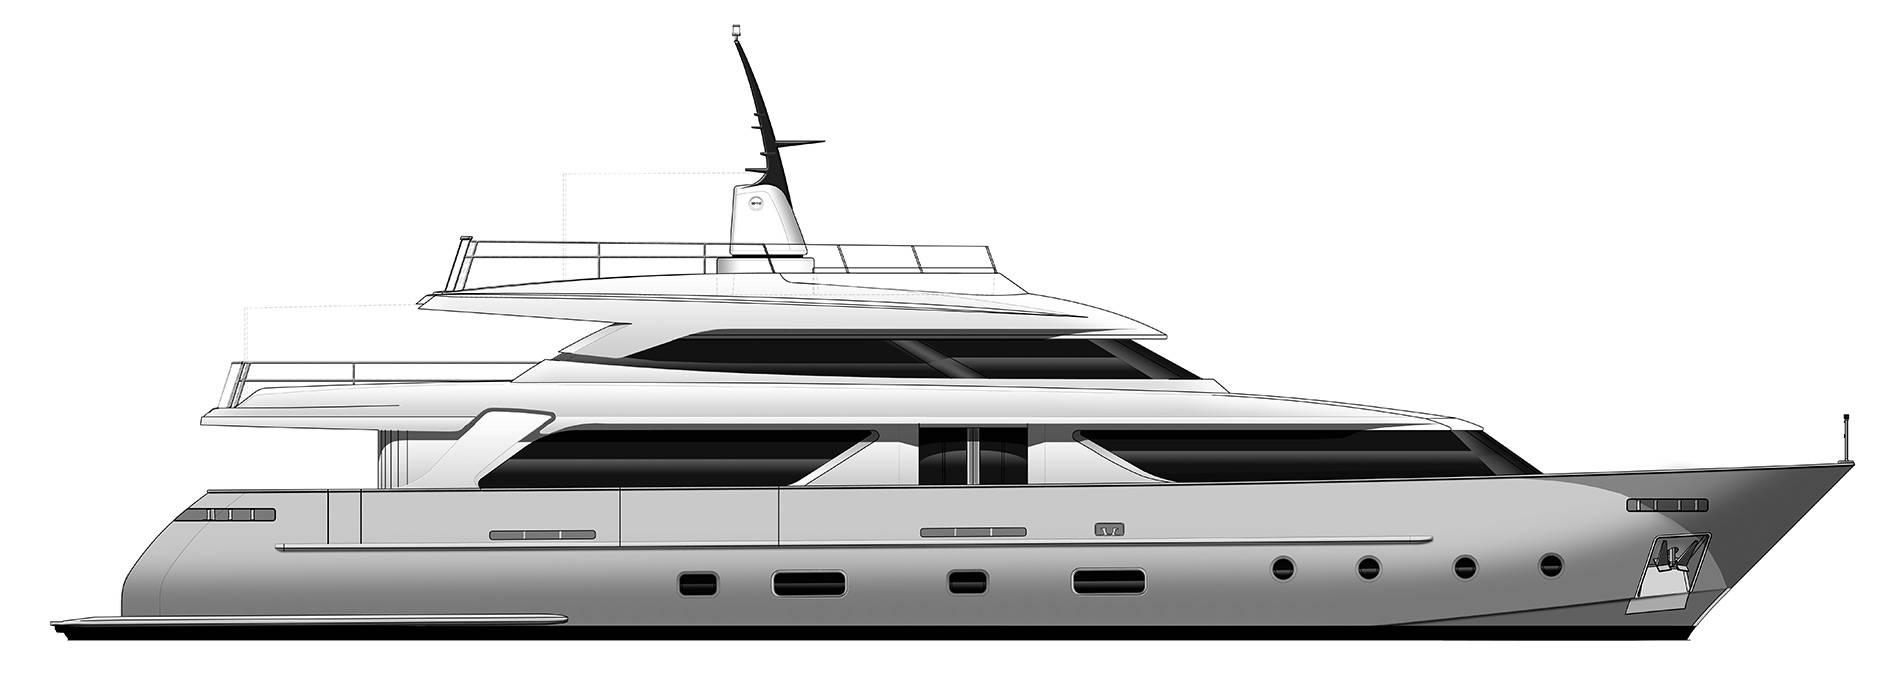 Sanlorenzo Yachts SD112 Perfil